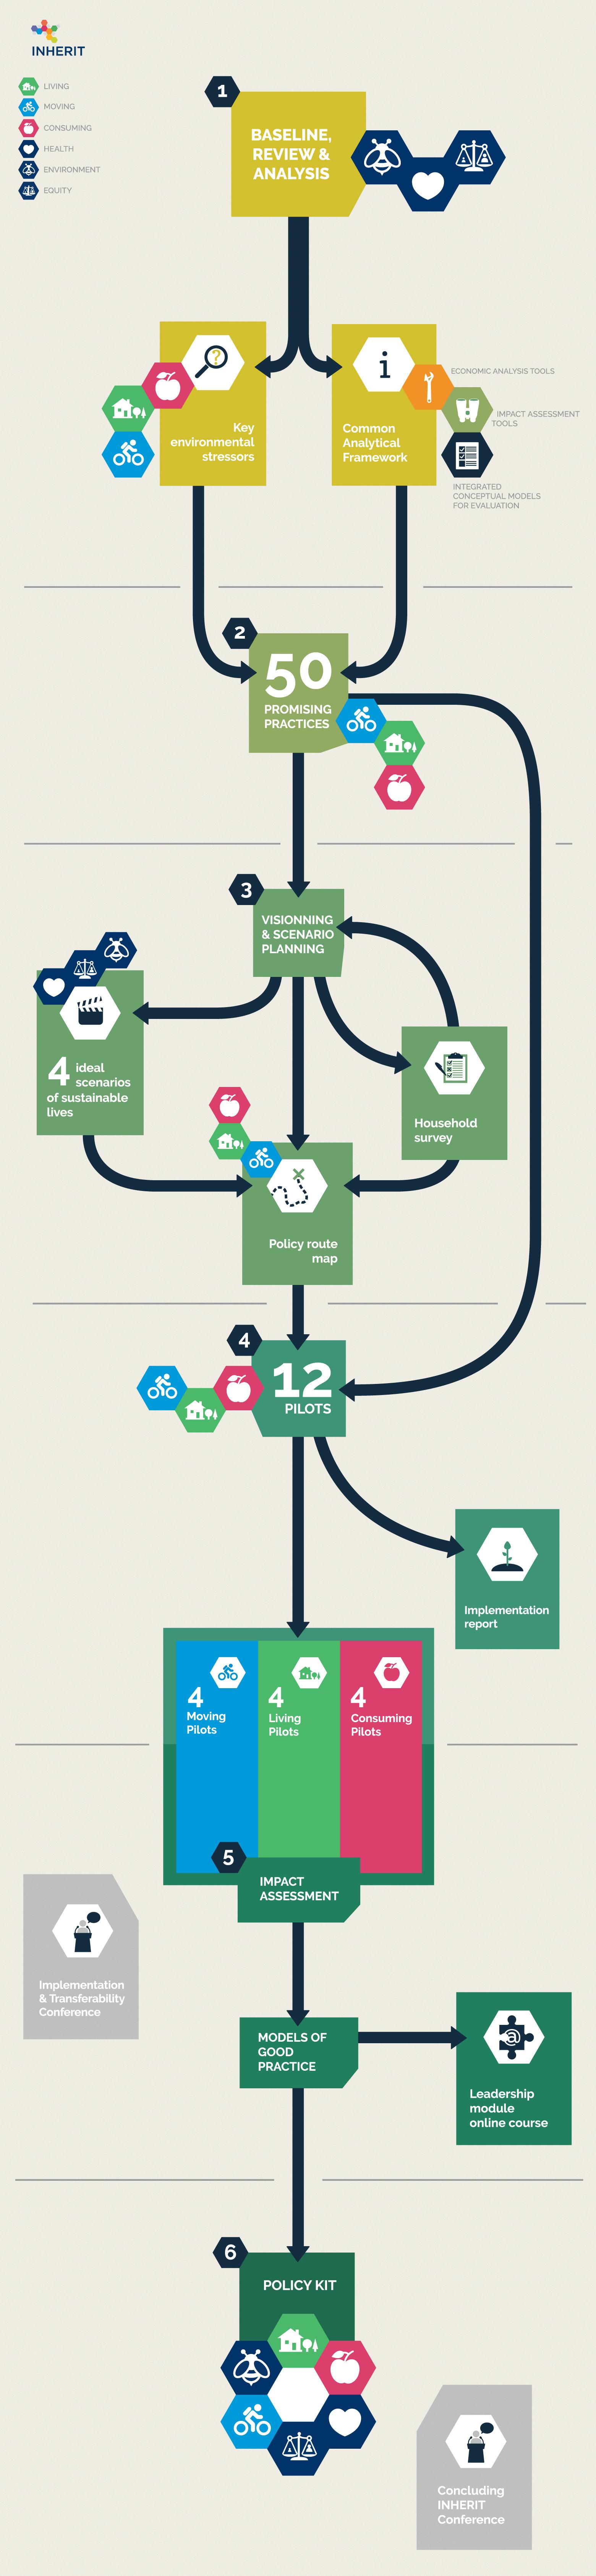 INHERIT roadmap web